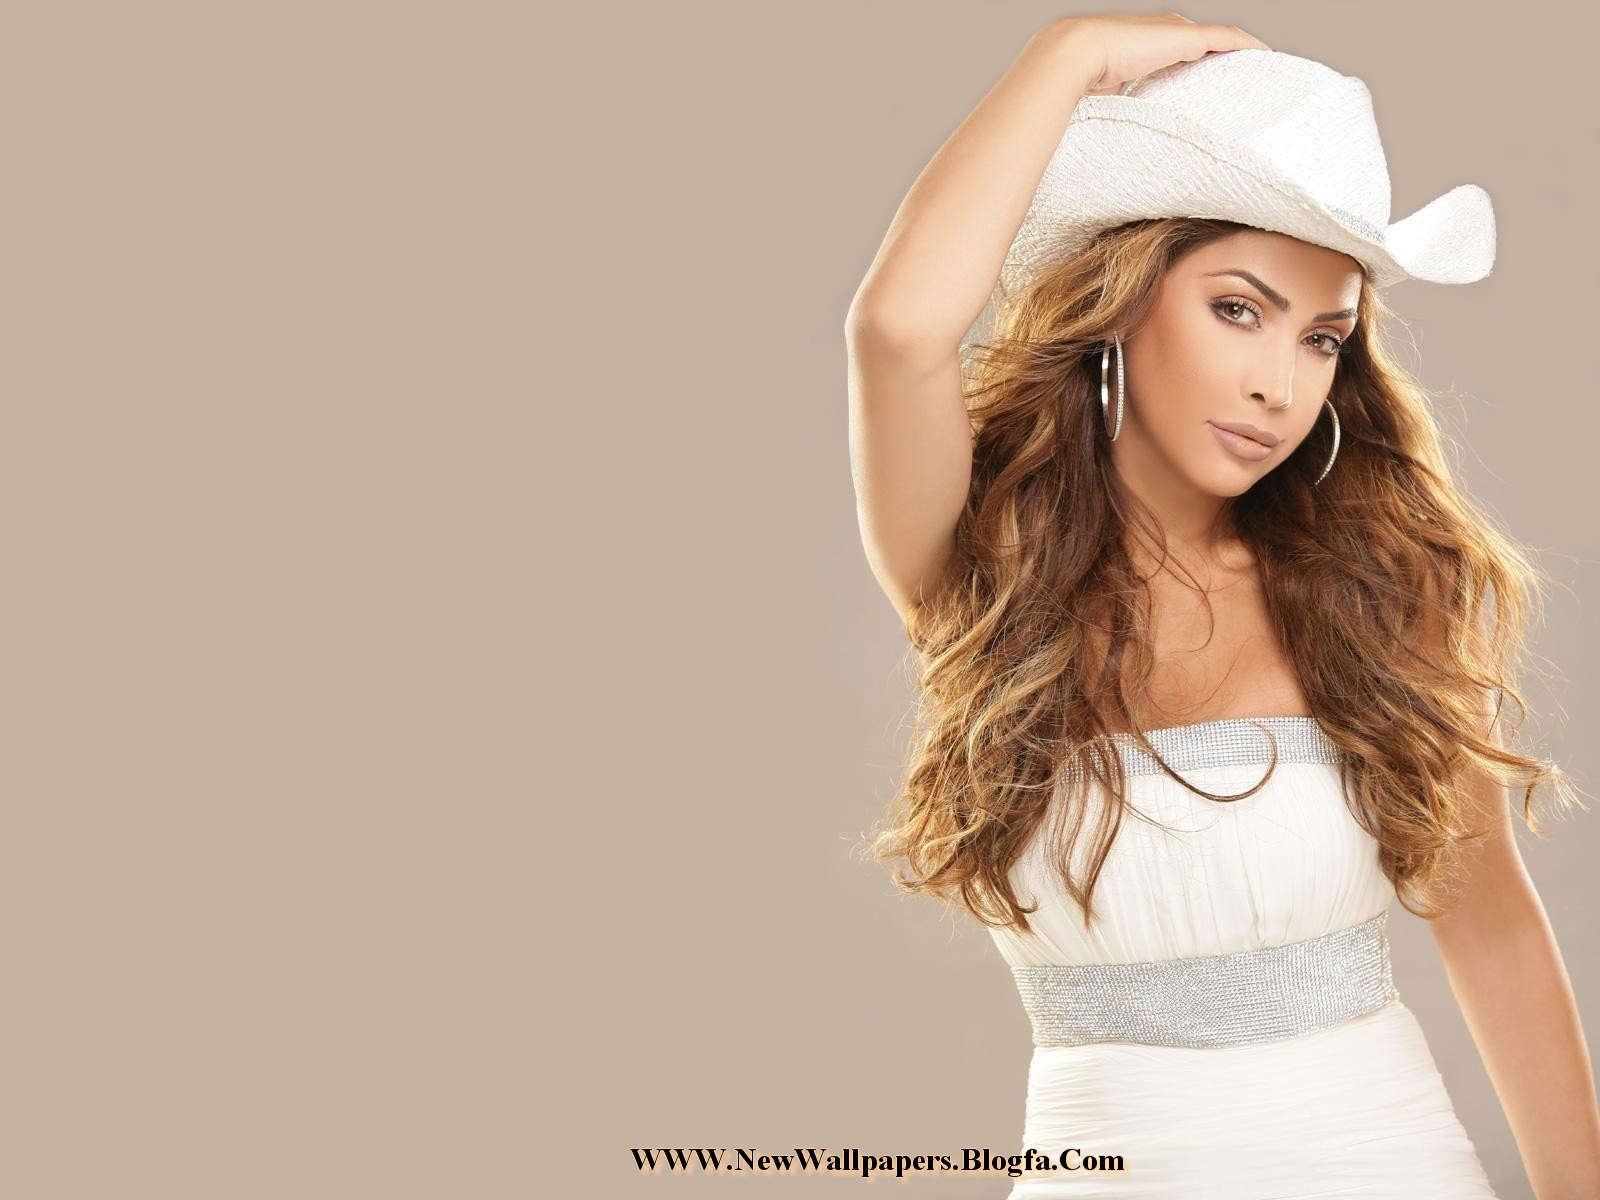 نوال الزغبی،عرب،خوشگل،خواننده، Nawal Alzoghby،زیبا،فیلم،کلیپ